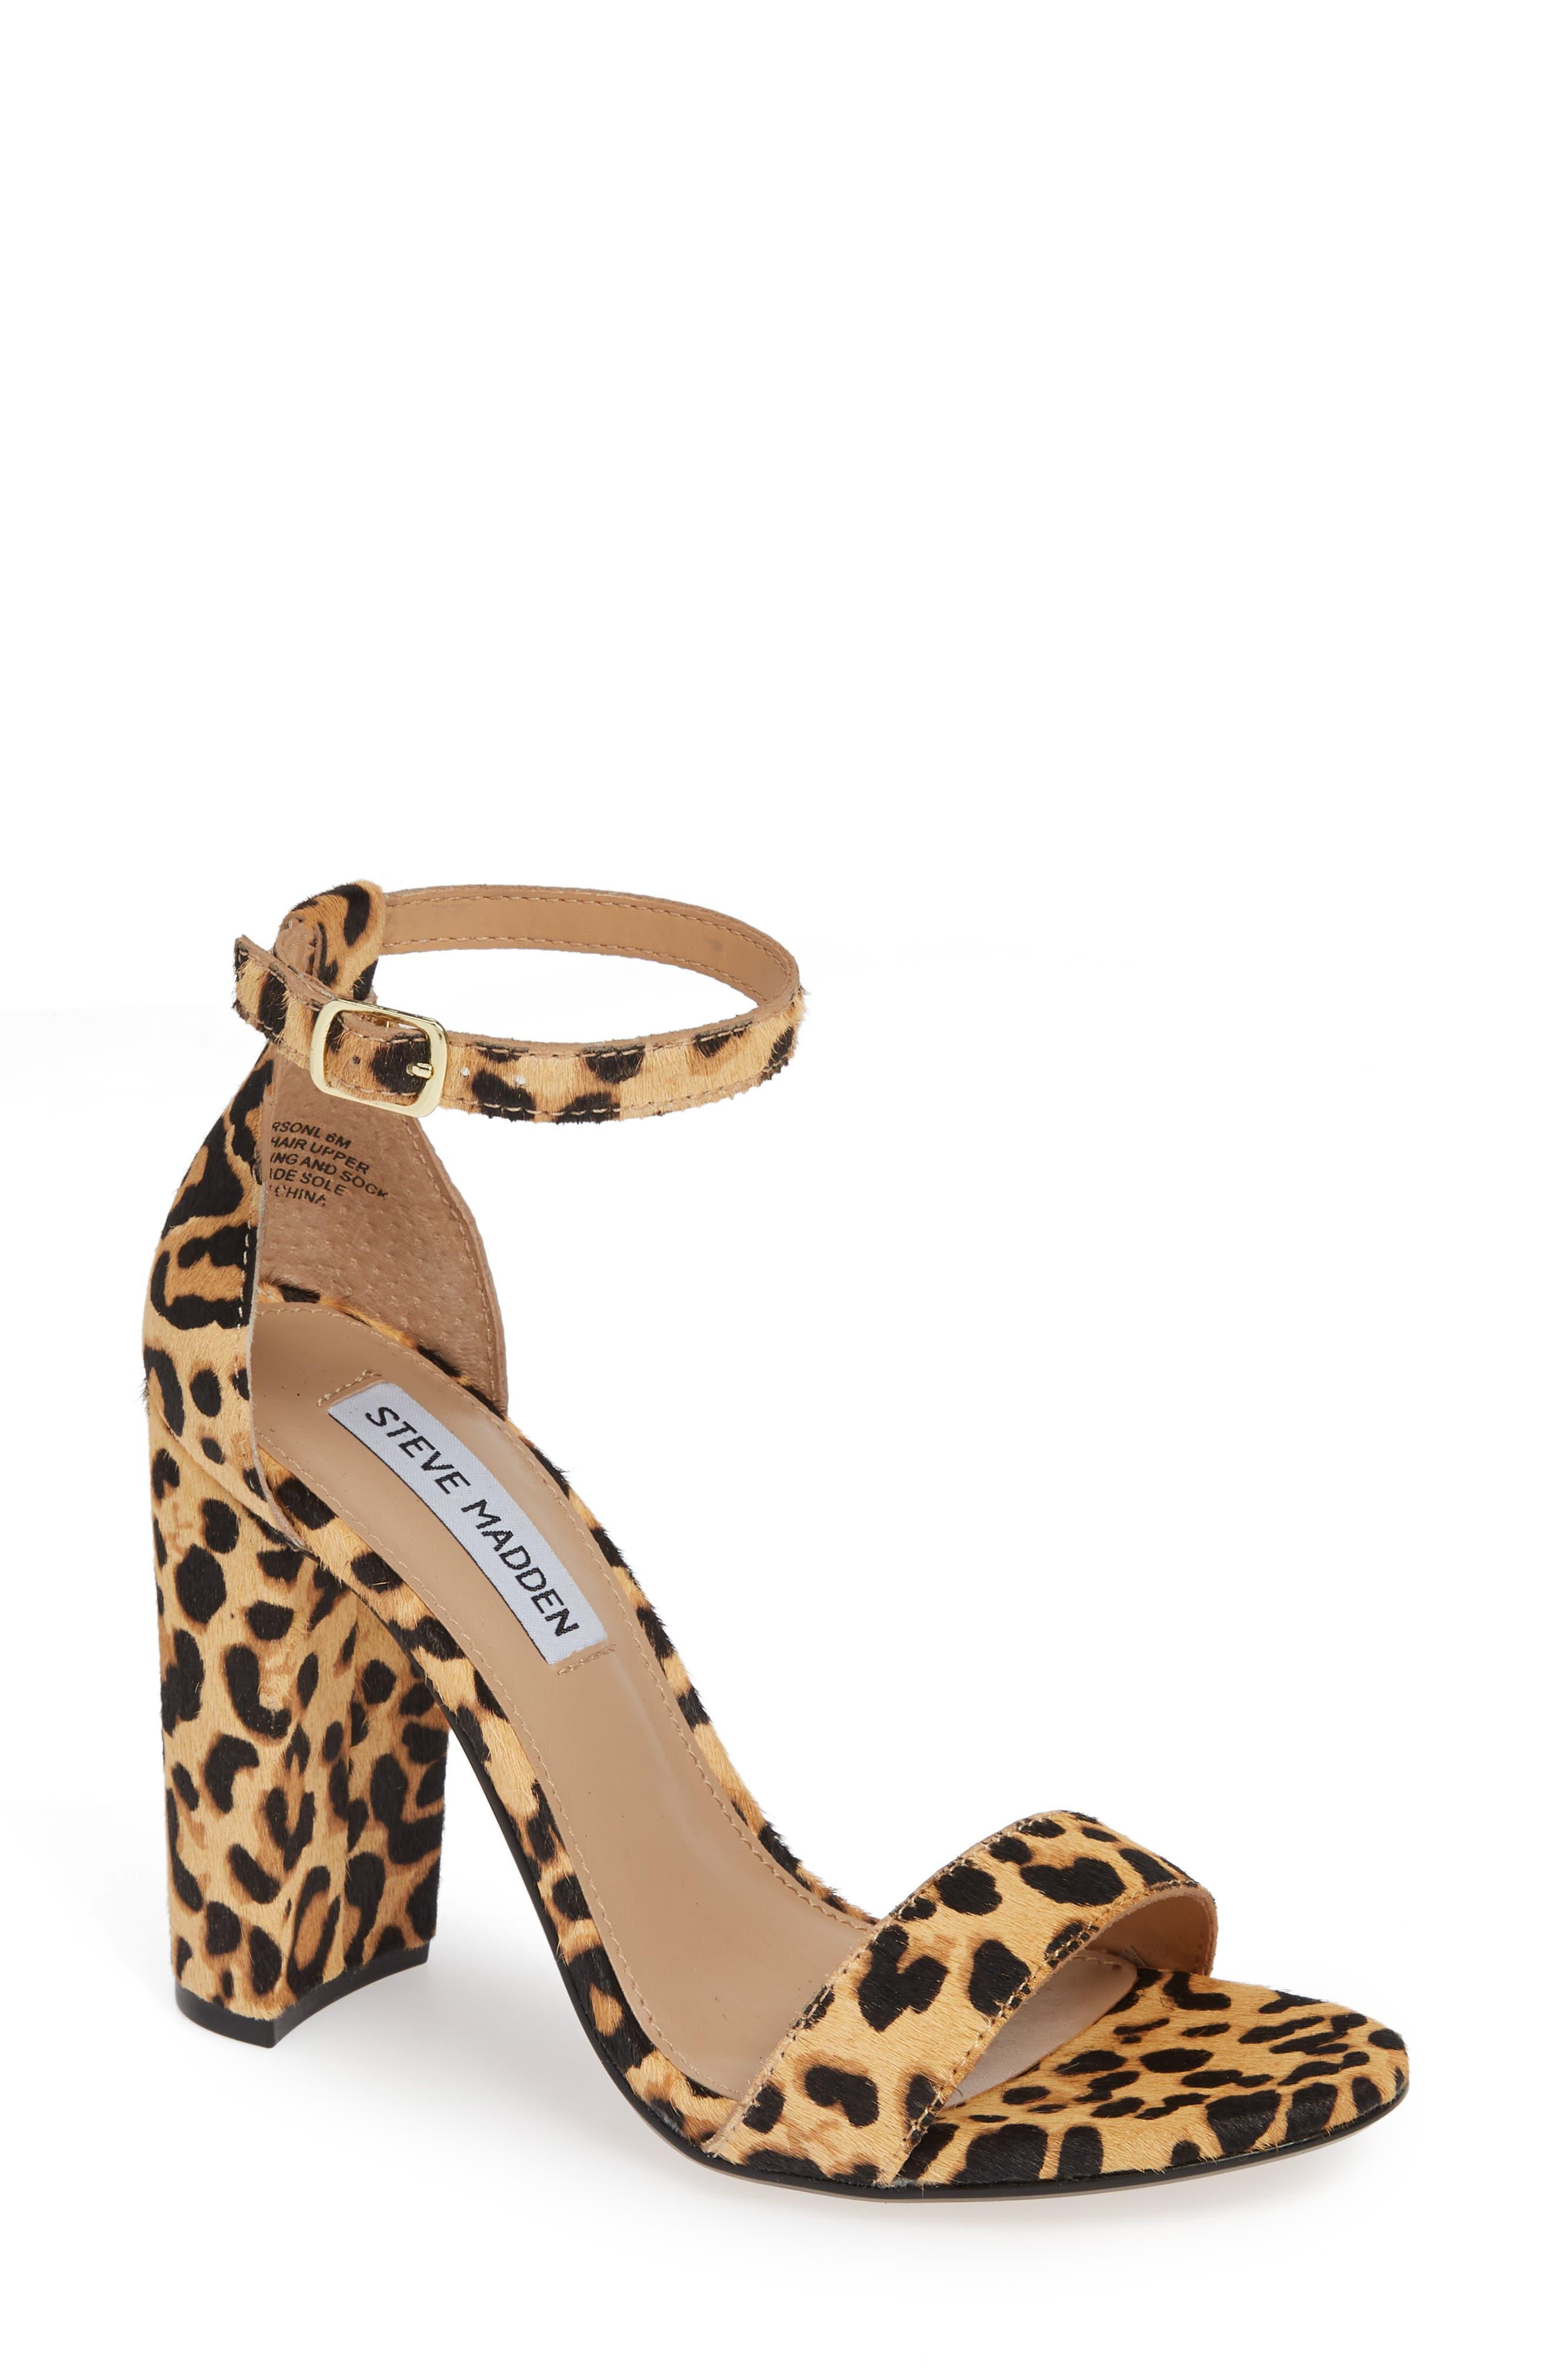 17830180eec7 Steve Madden Sandals - Women s